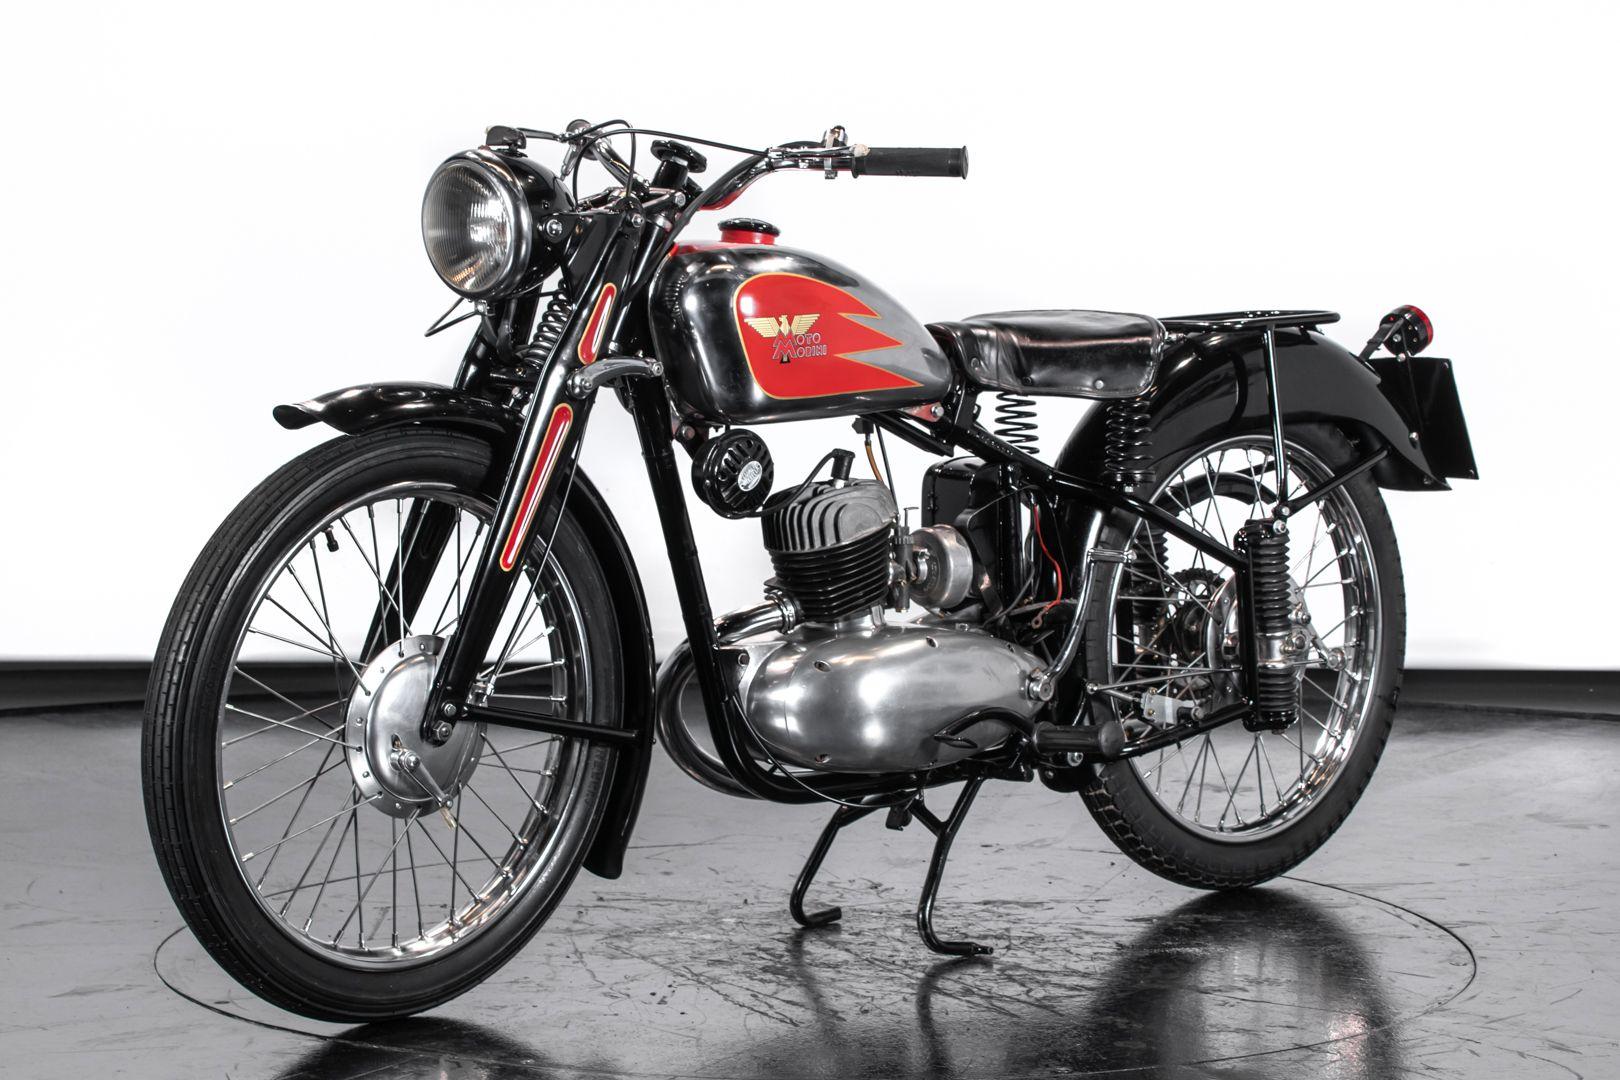 1952 Moto Morini Motore Lungo 2T 125 78769